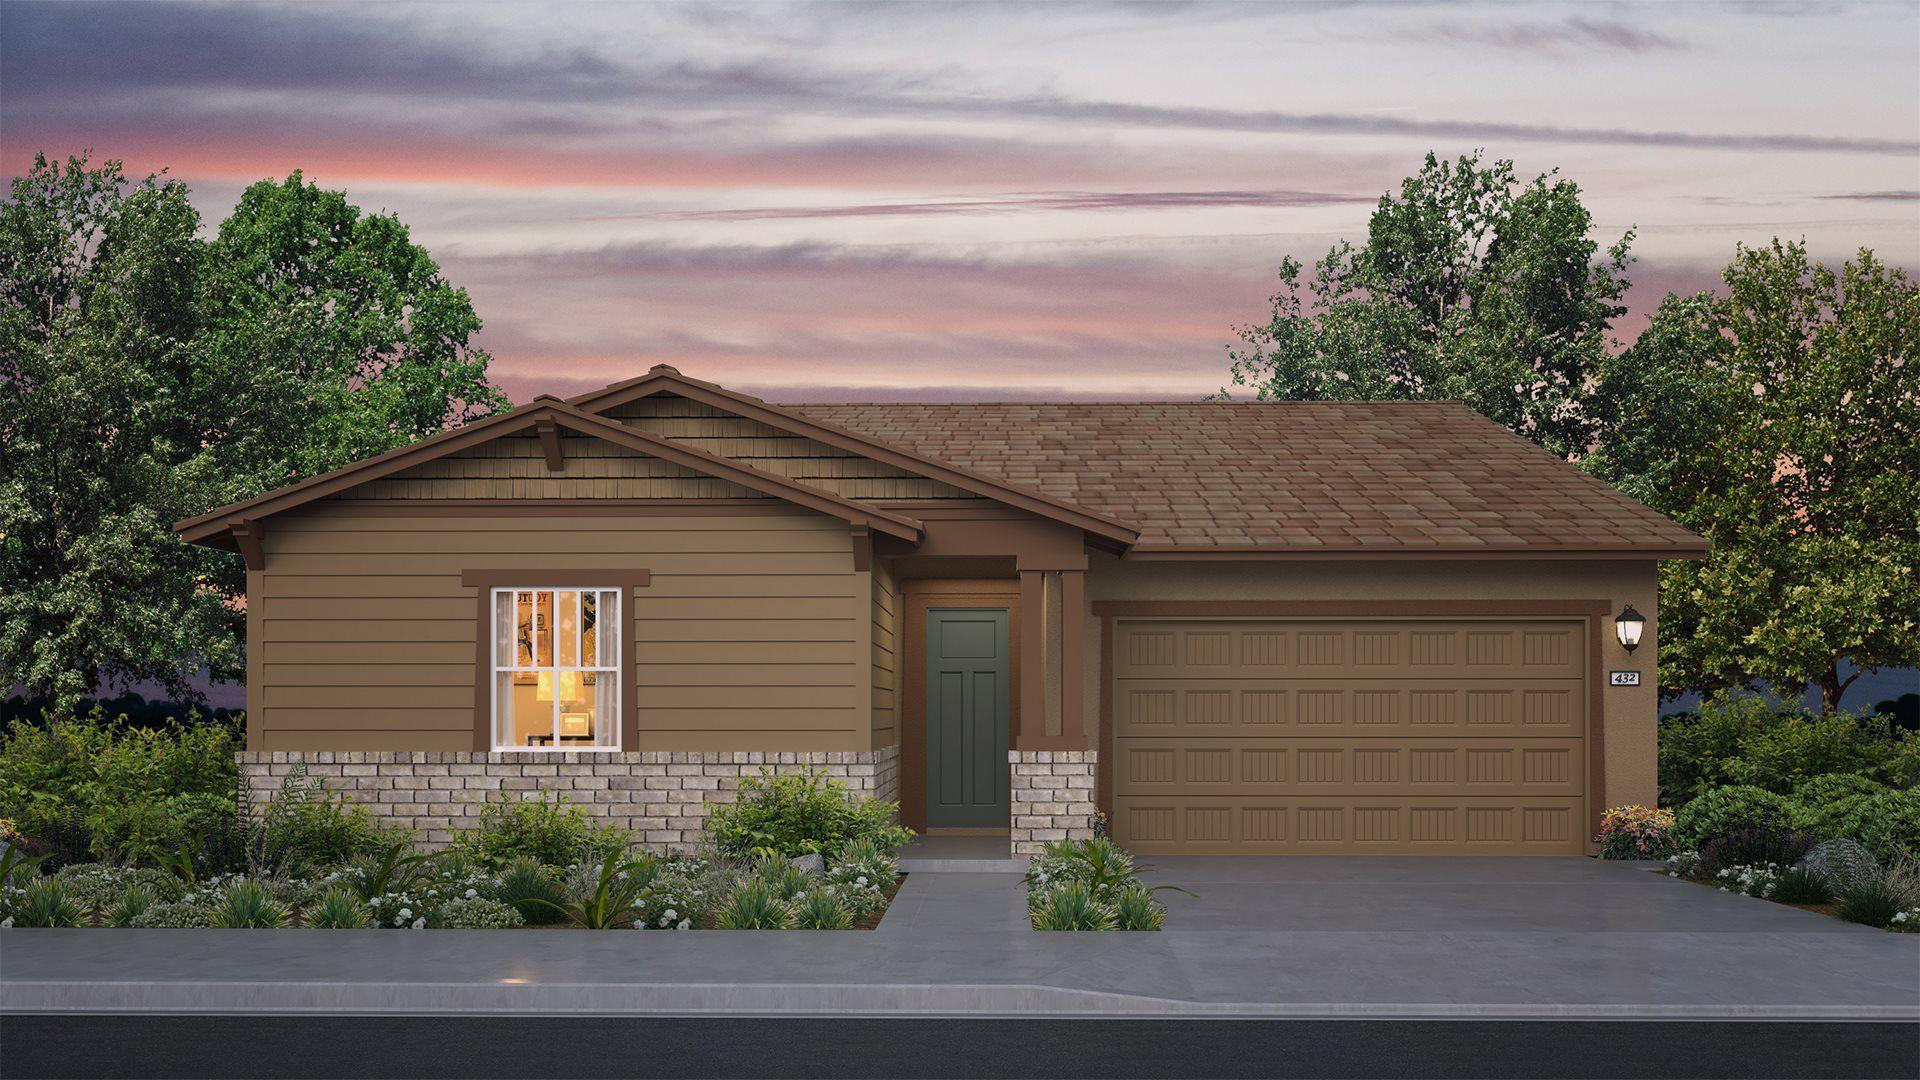 Residence 2162 | Elevation B